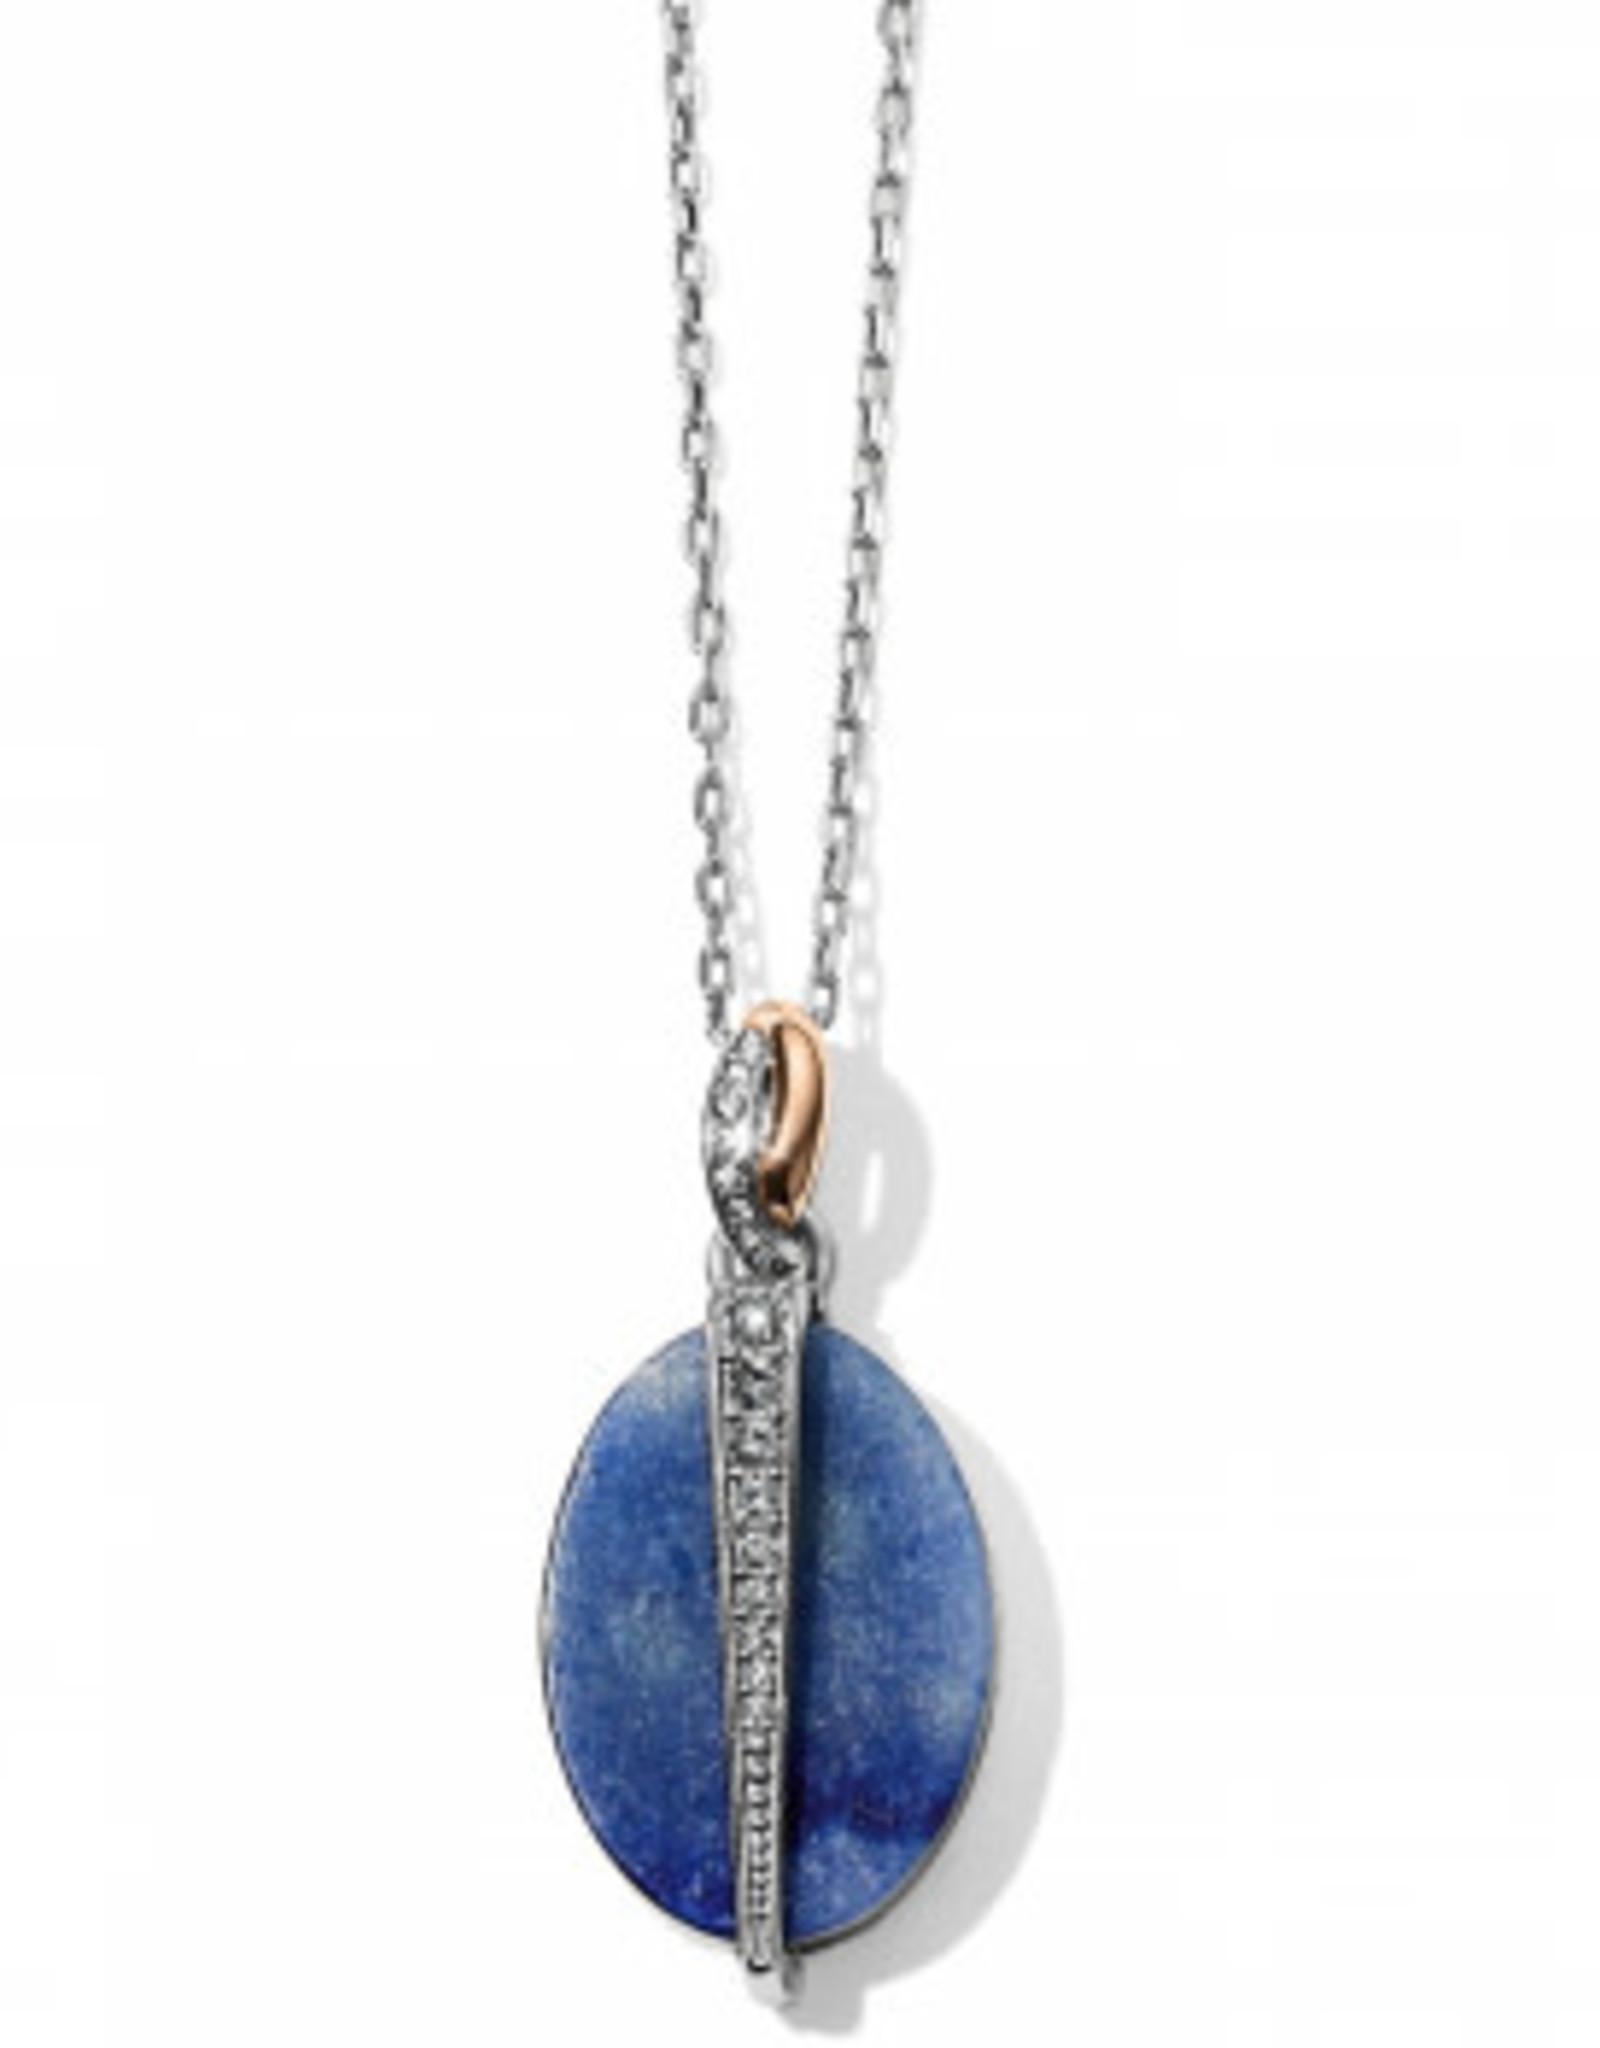 Brighton Brighton, Neptune's Rings Oval Brazil Blue Quartz Reversible Short Necklace